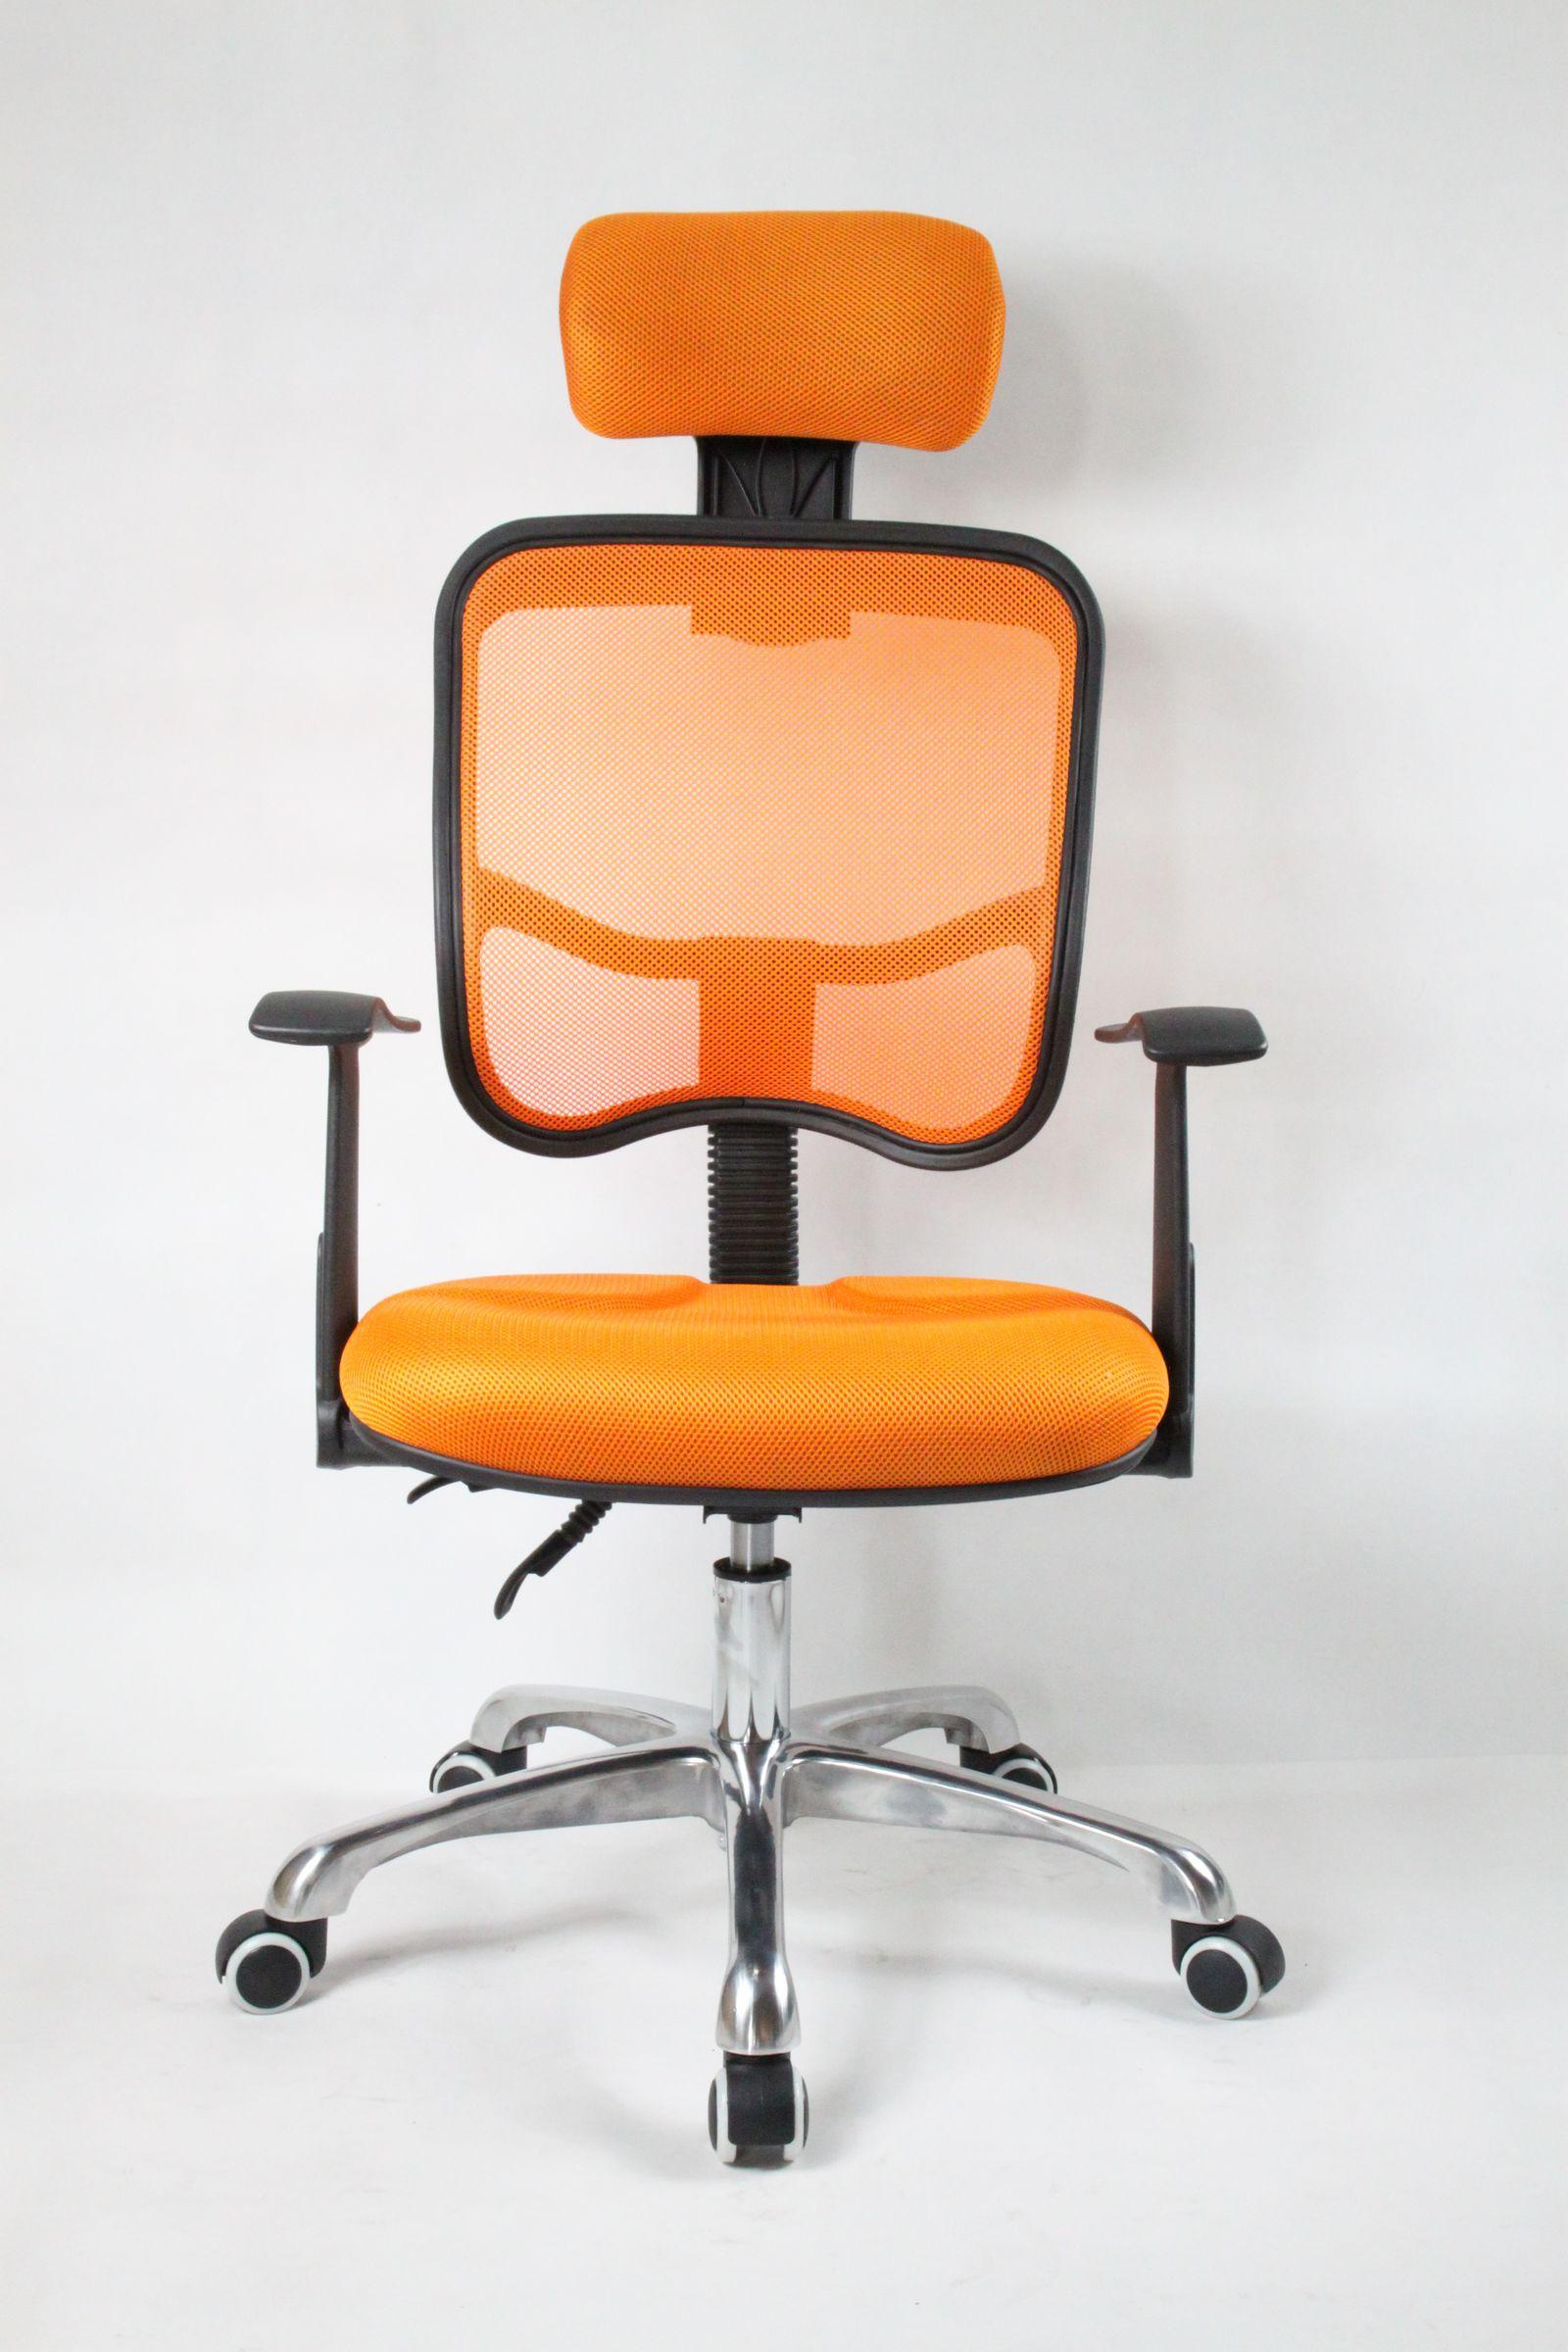 designer computer chairs furniture inspiration